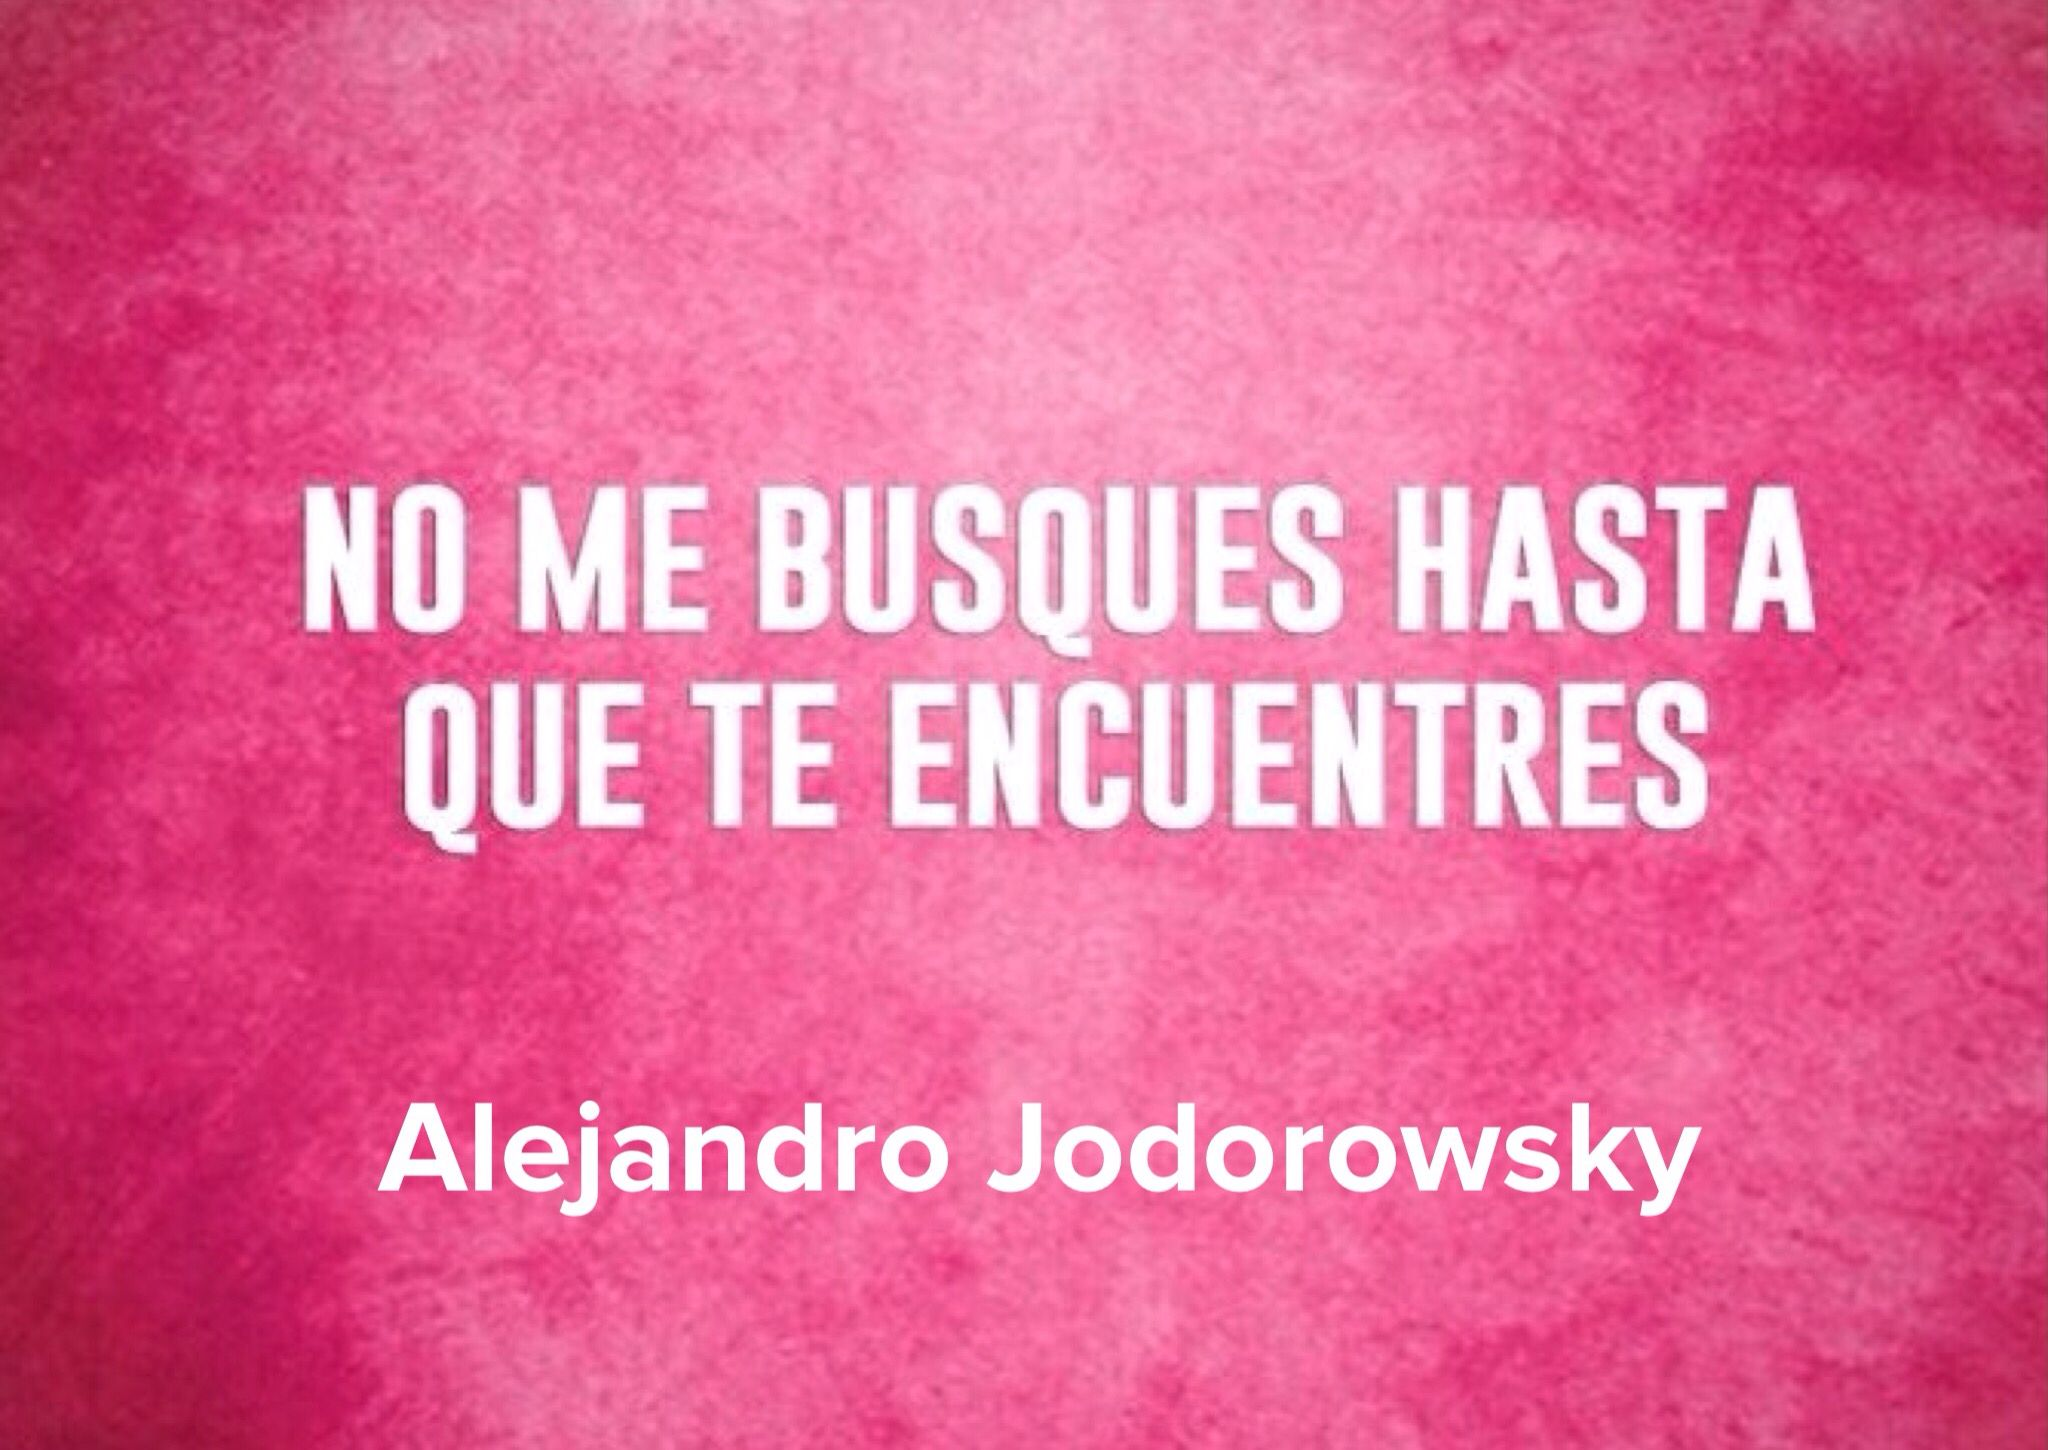 Alejandro Jodorowsky  Mensajes  Life Quotes -1985